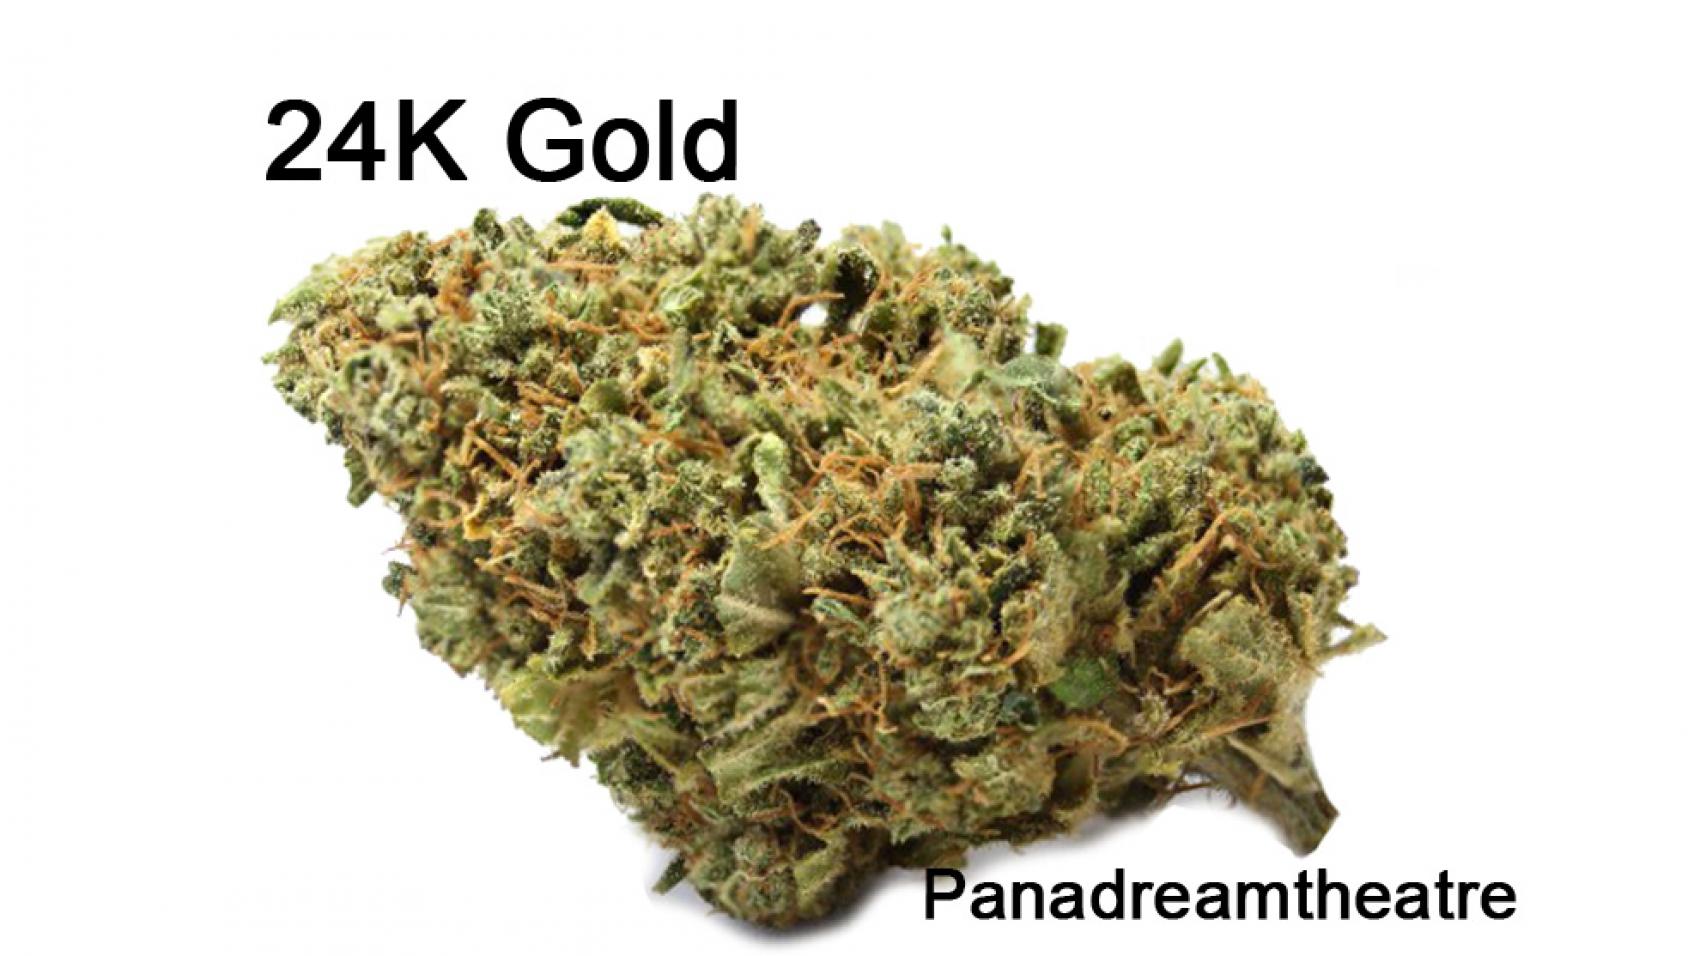 24k-gold-weed-strain